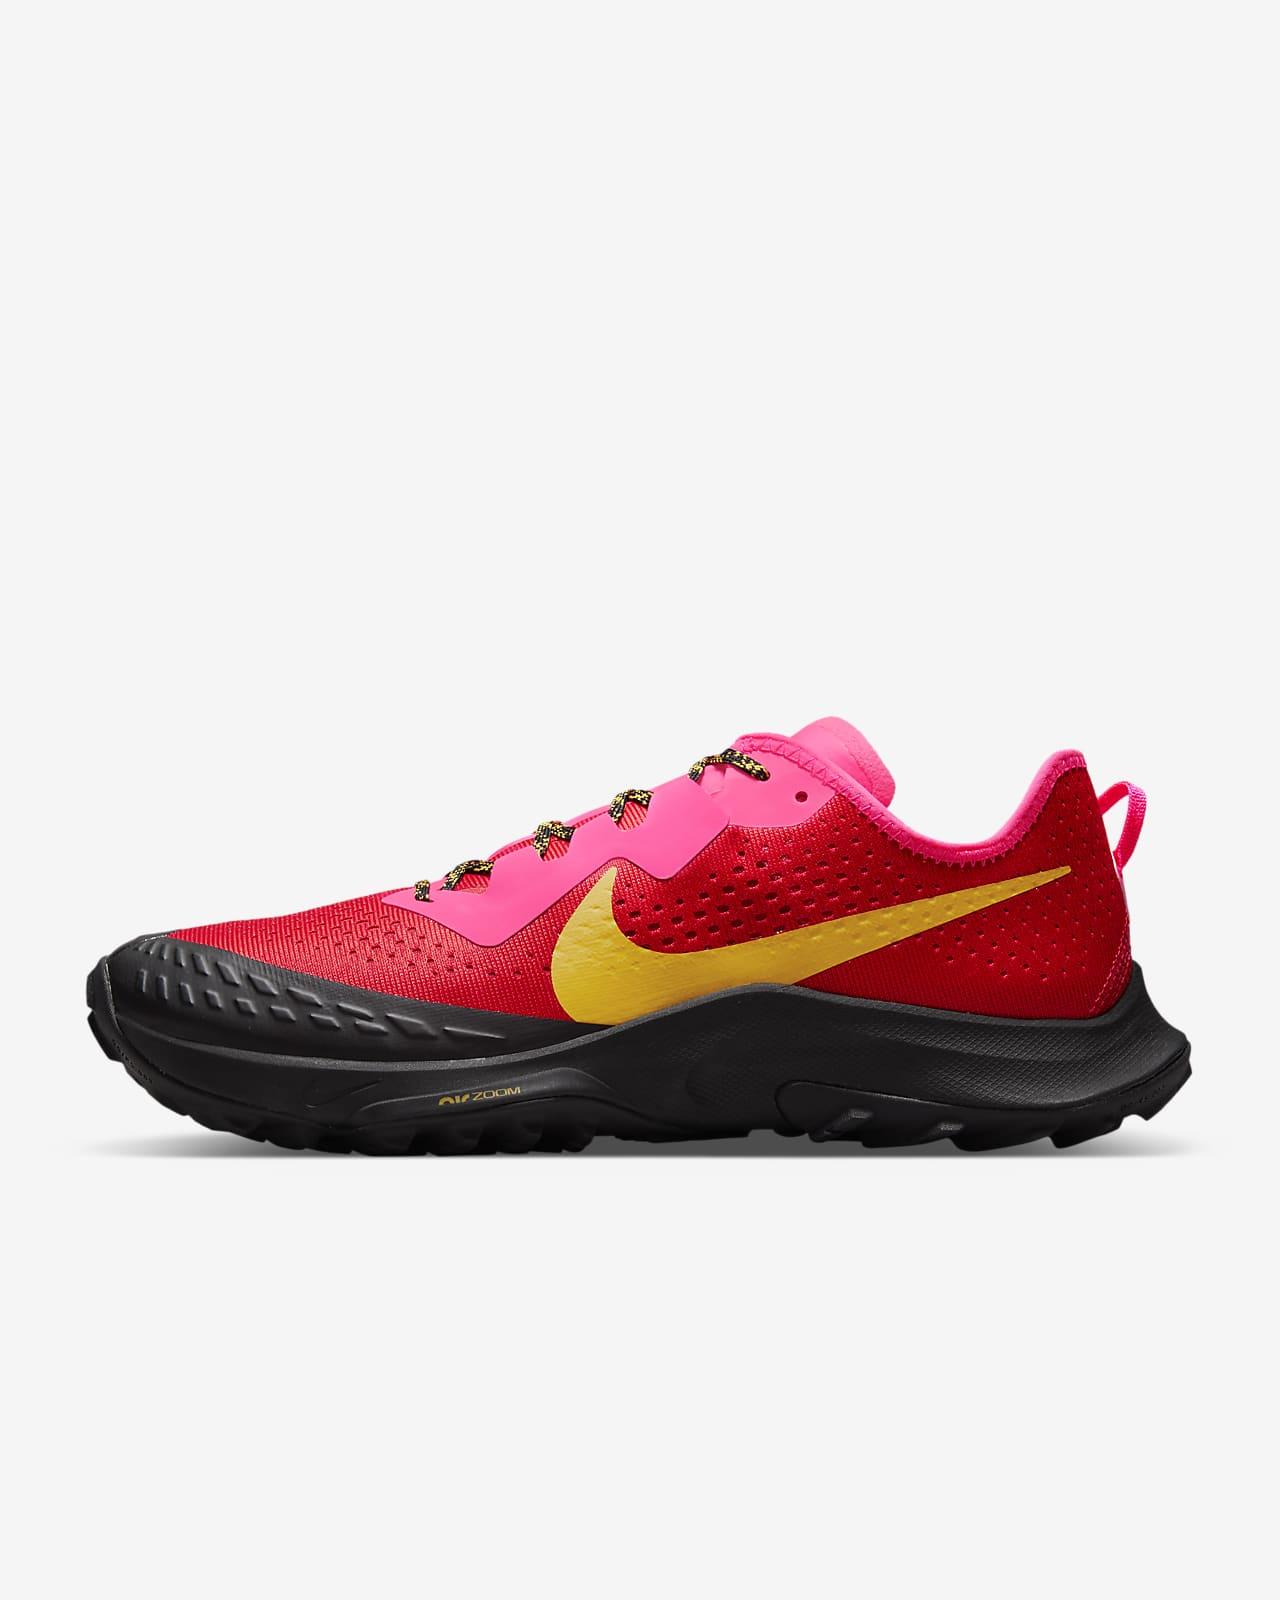 Chaussure de trail Nike Air Zoom Terra Kiger 7 pour Homme. Nike LU